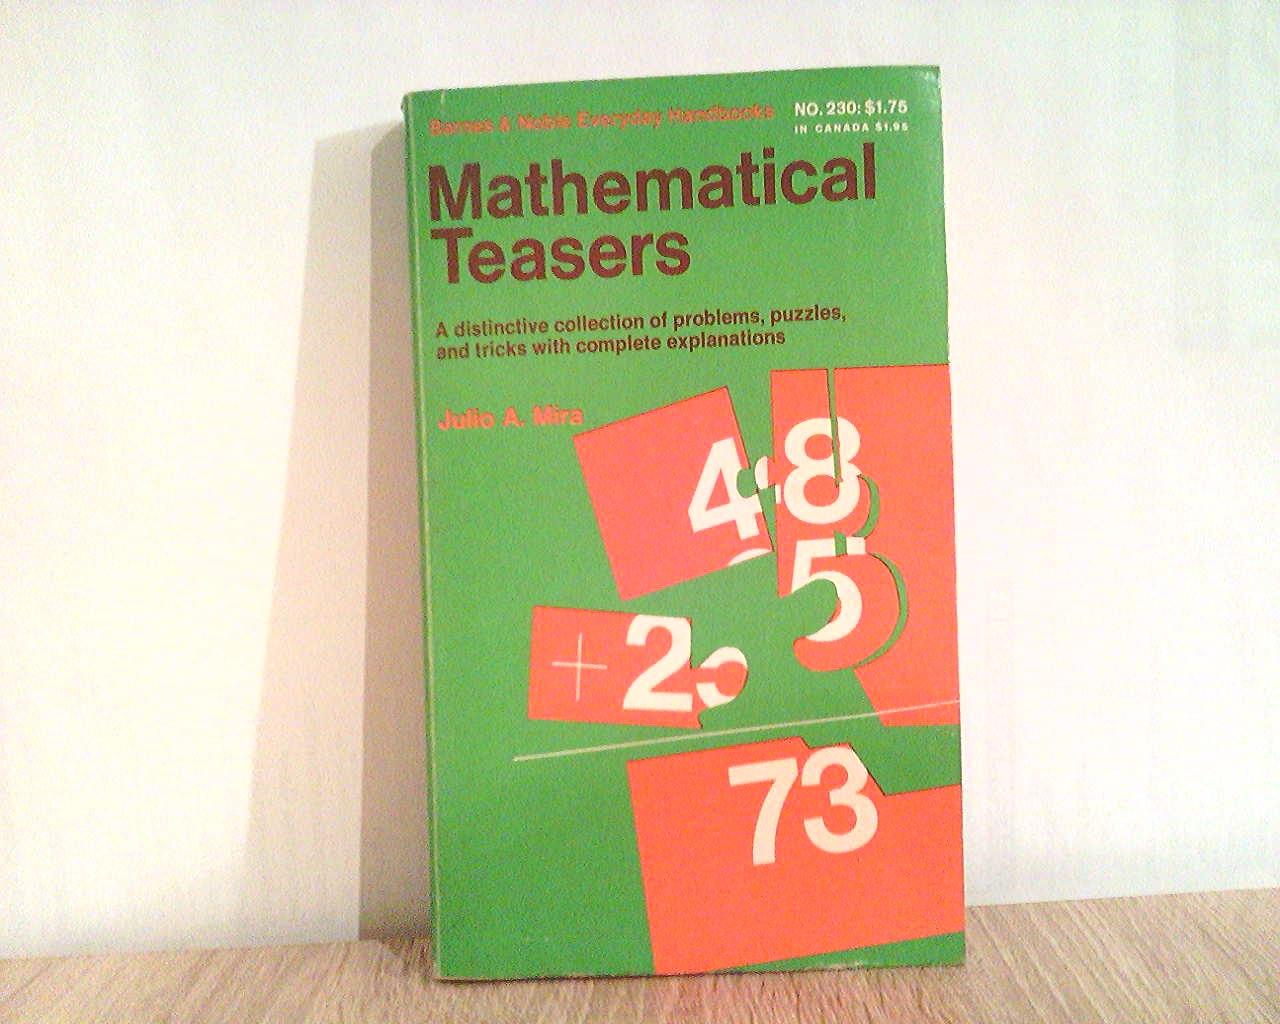 Mira, Julio A.: Mathematical Teasers (Everyday handbooks)